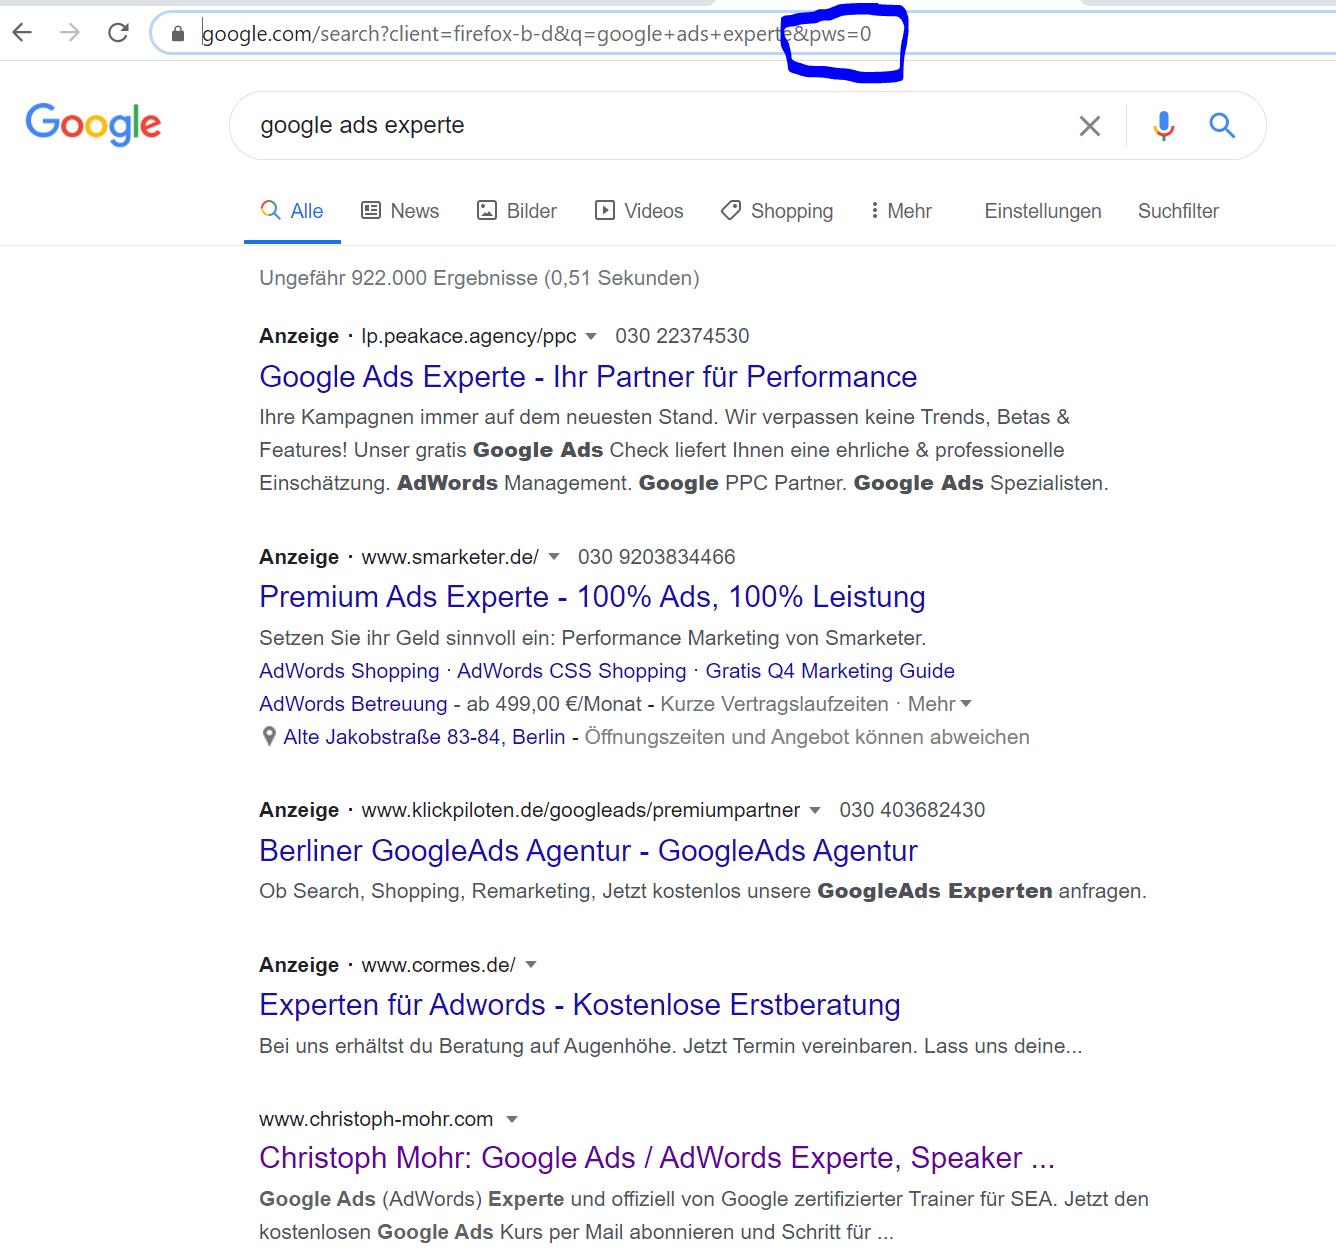 Google unpersonalisierte Suche